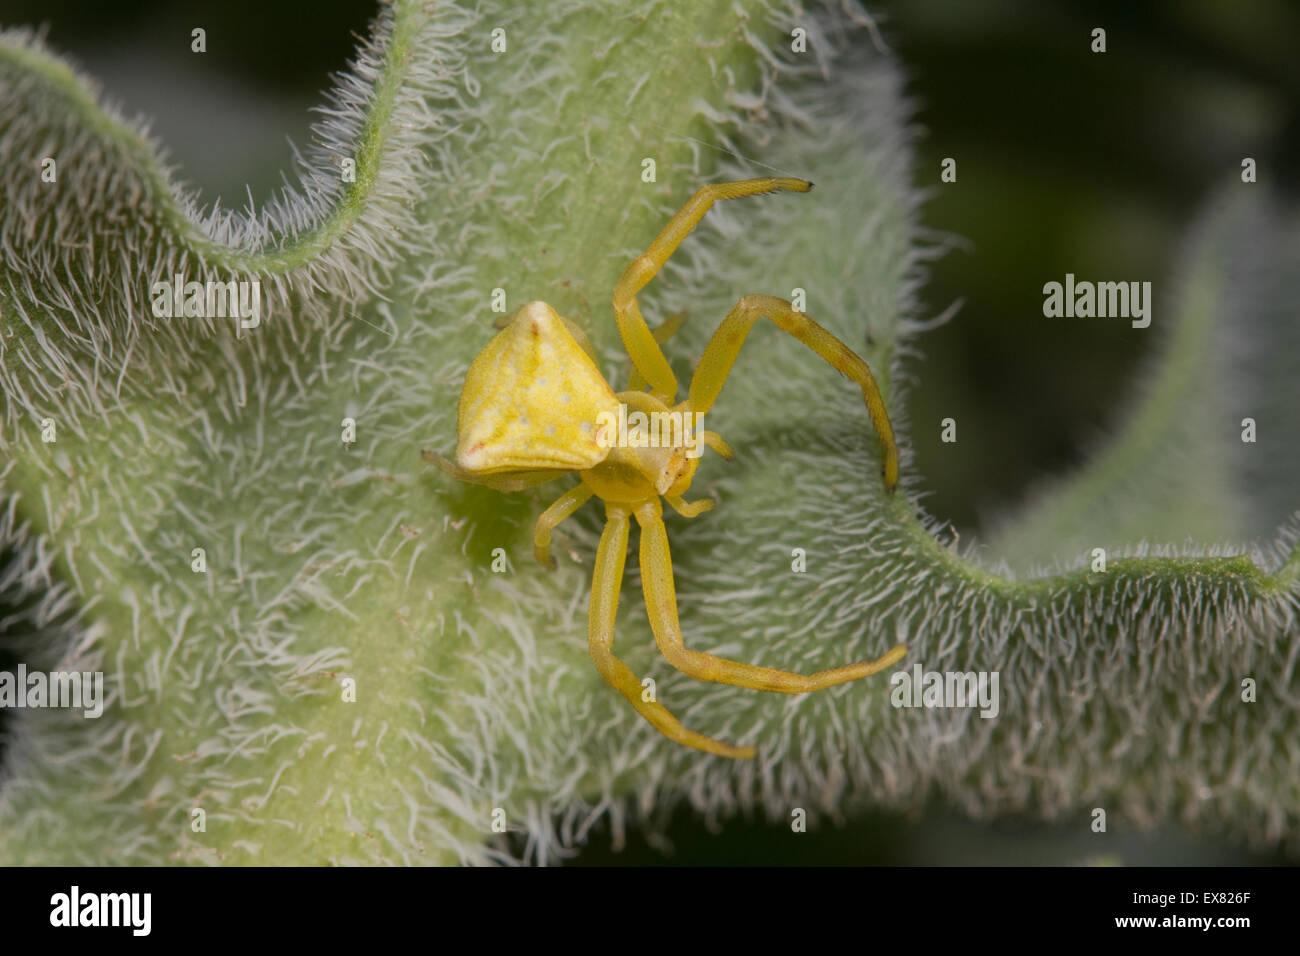 Closeup of yellow crab spider (sp) Thomisus onustus, invertebrate waiting in ambush on a leaf. Lemnos/ Limnos island, - Stock Image